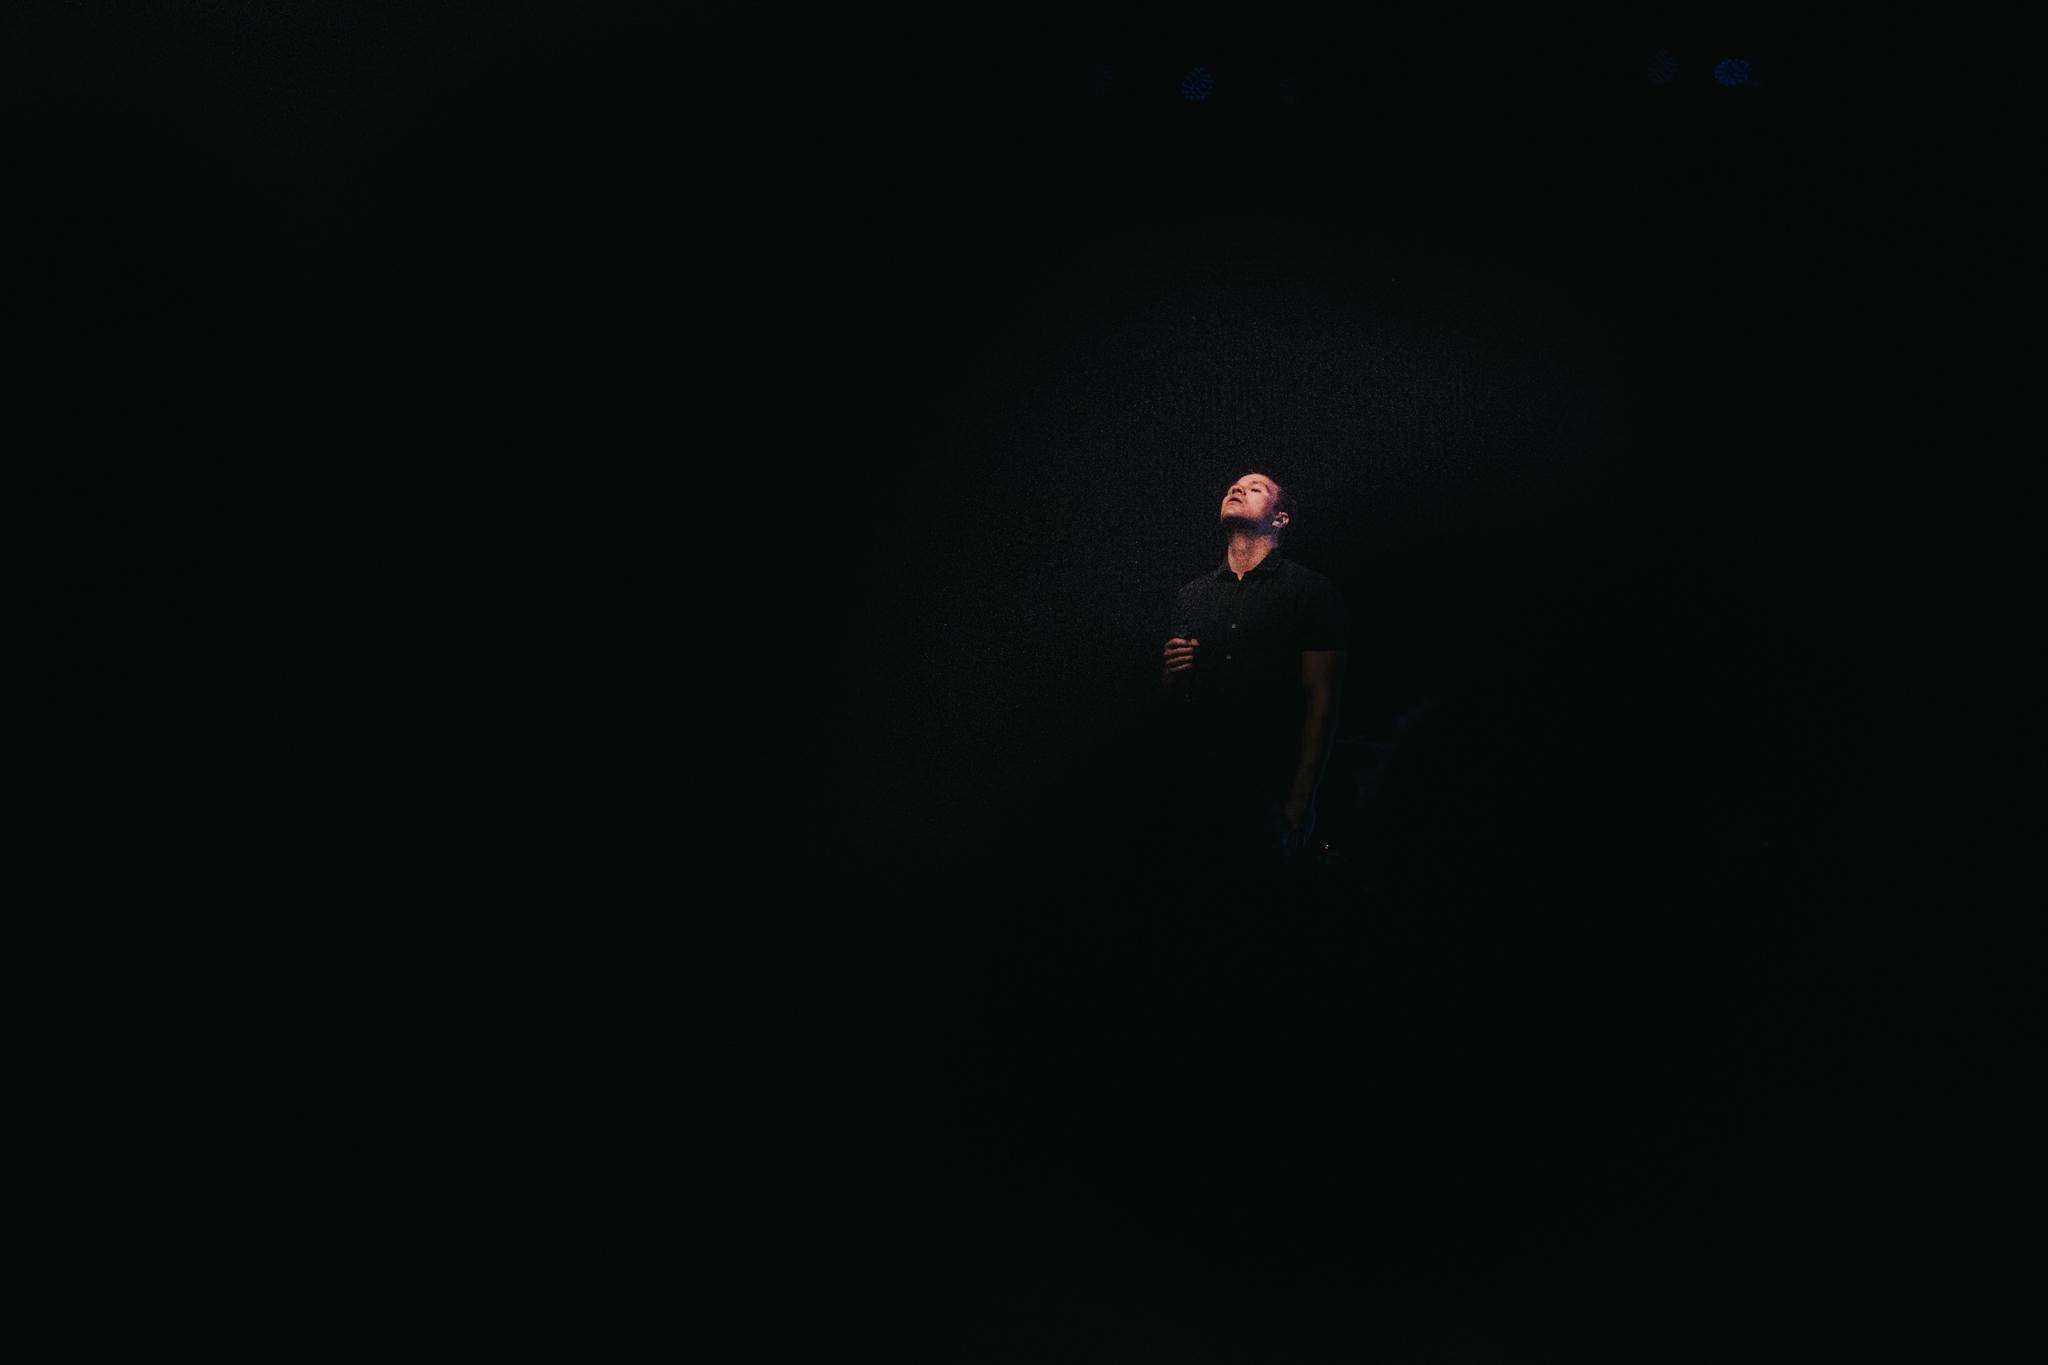 Lafferty Photo - Dance Gavin Dance 03.08.17-8275.jpg